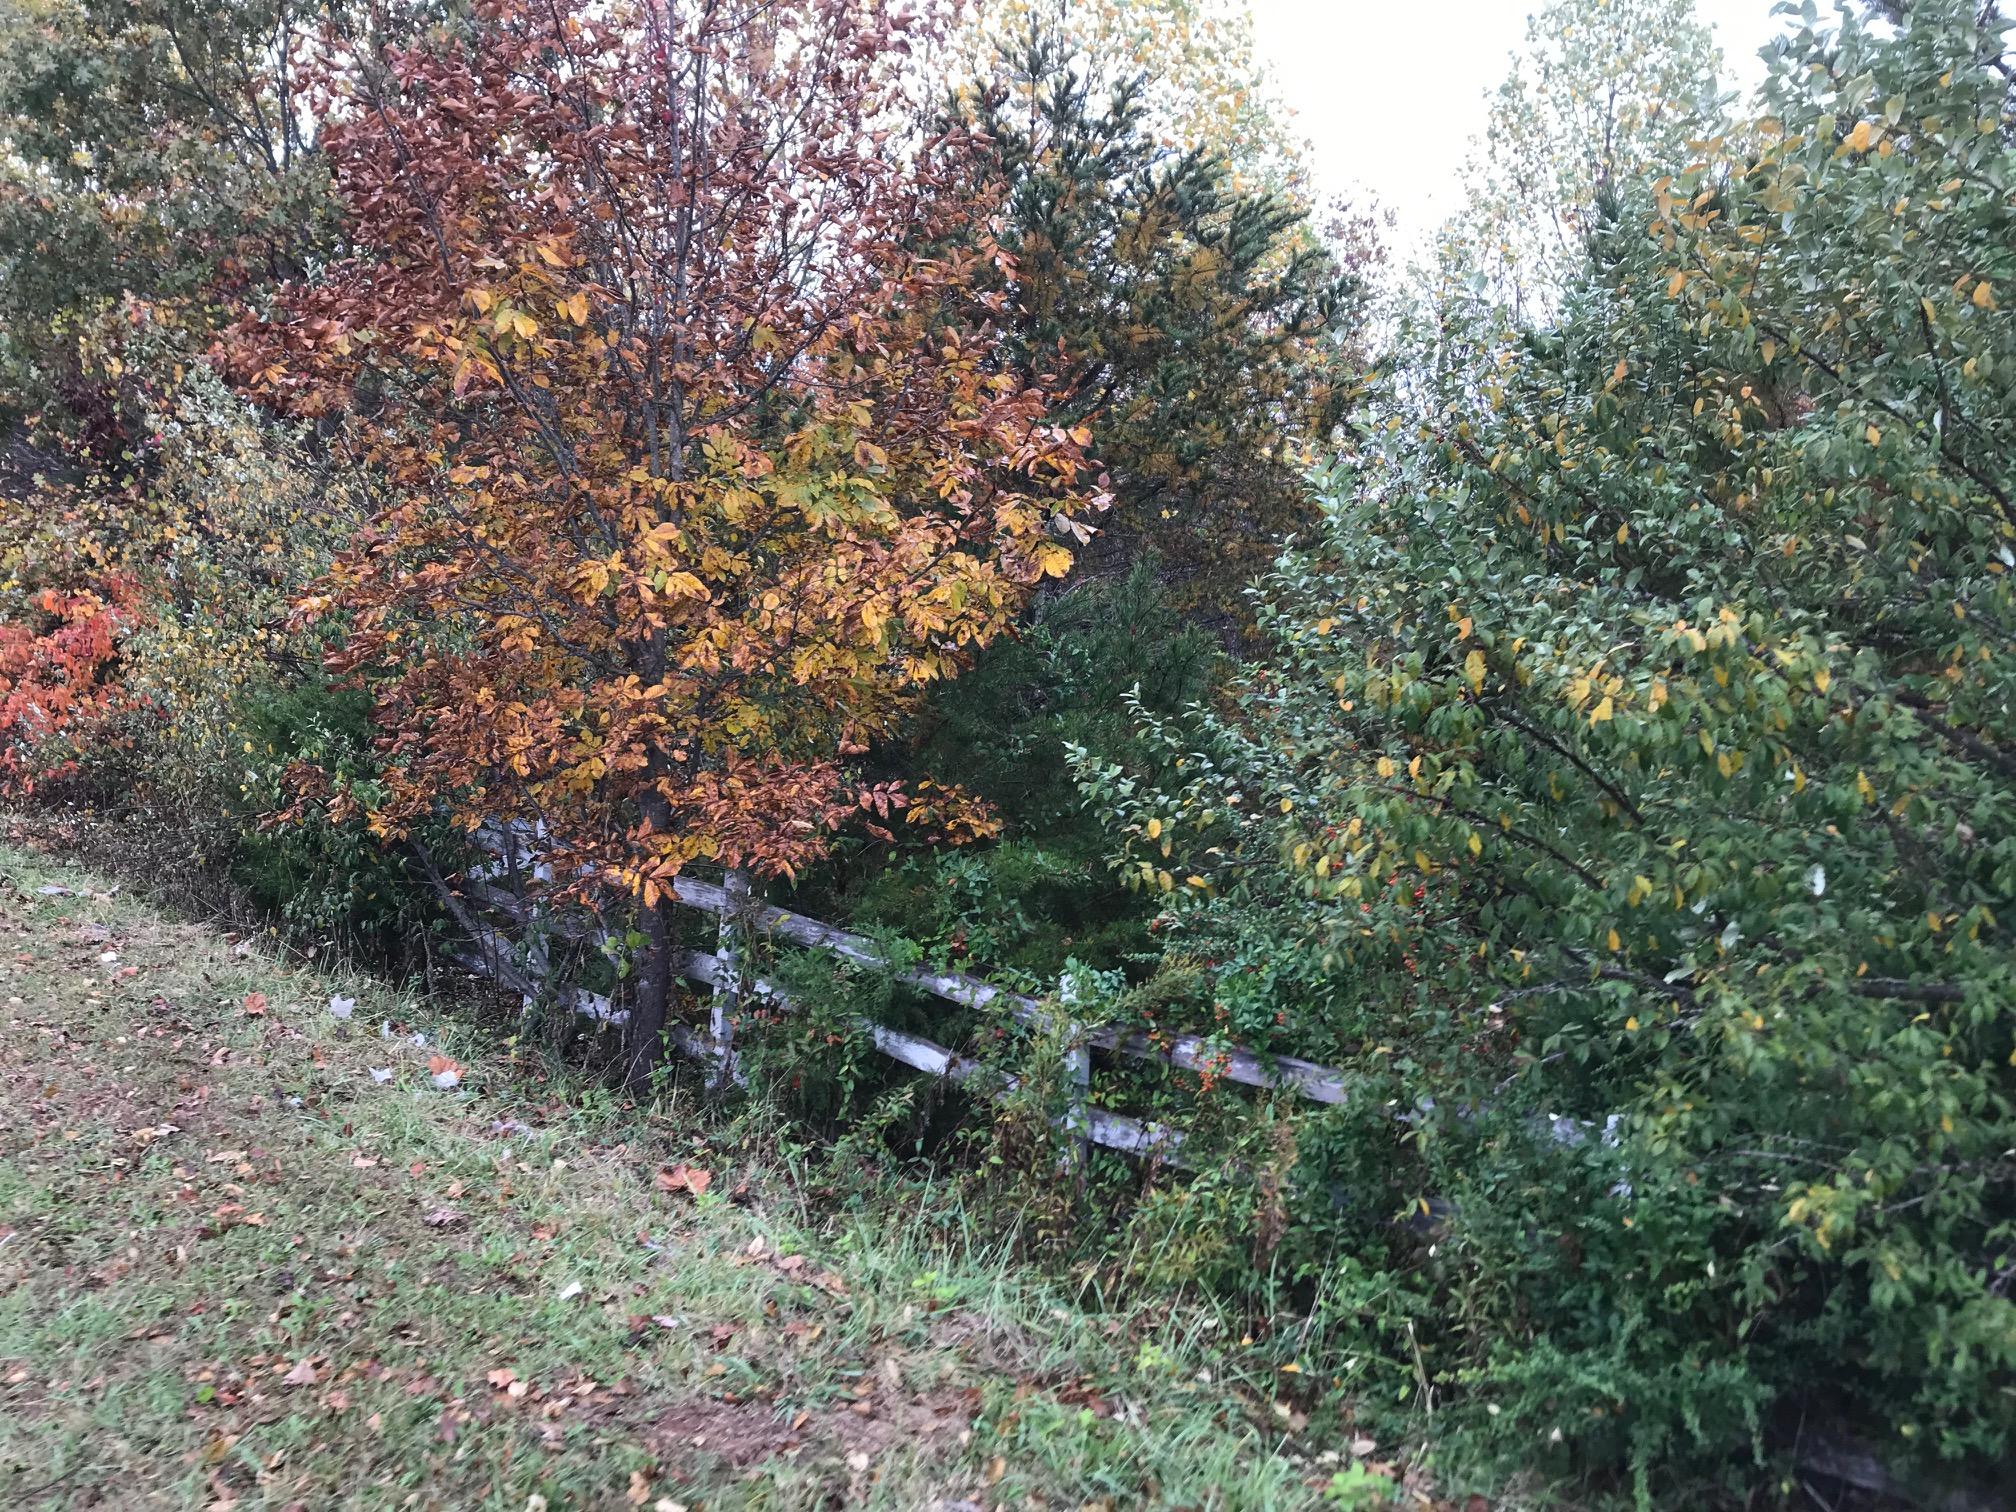 Pittsylvania County Land on Easome Road